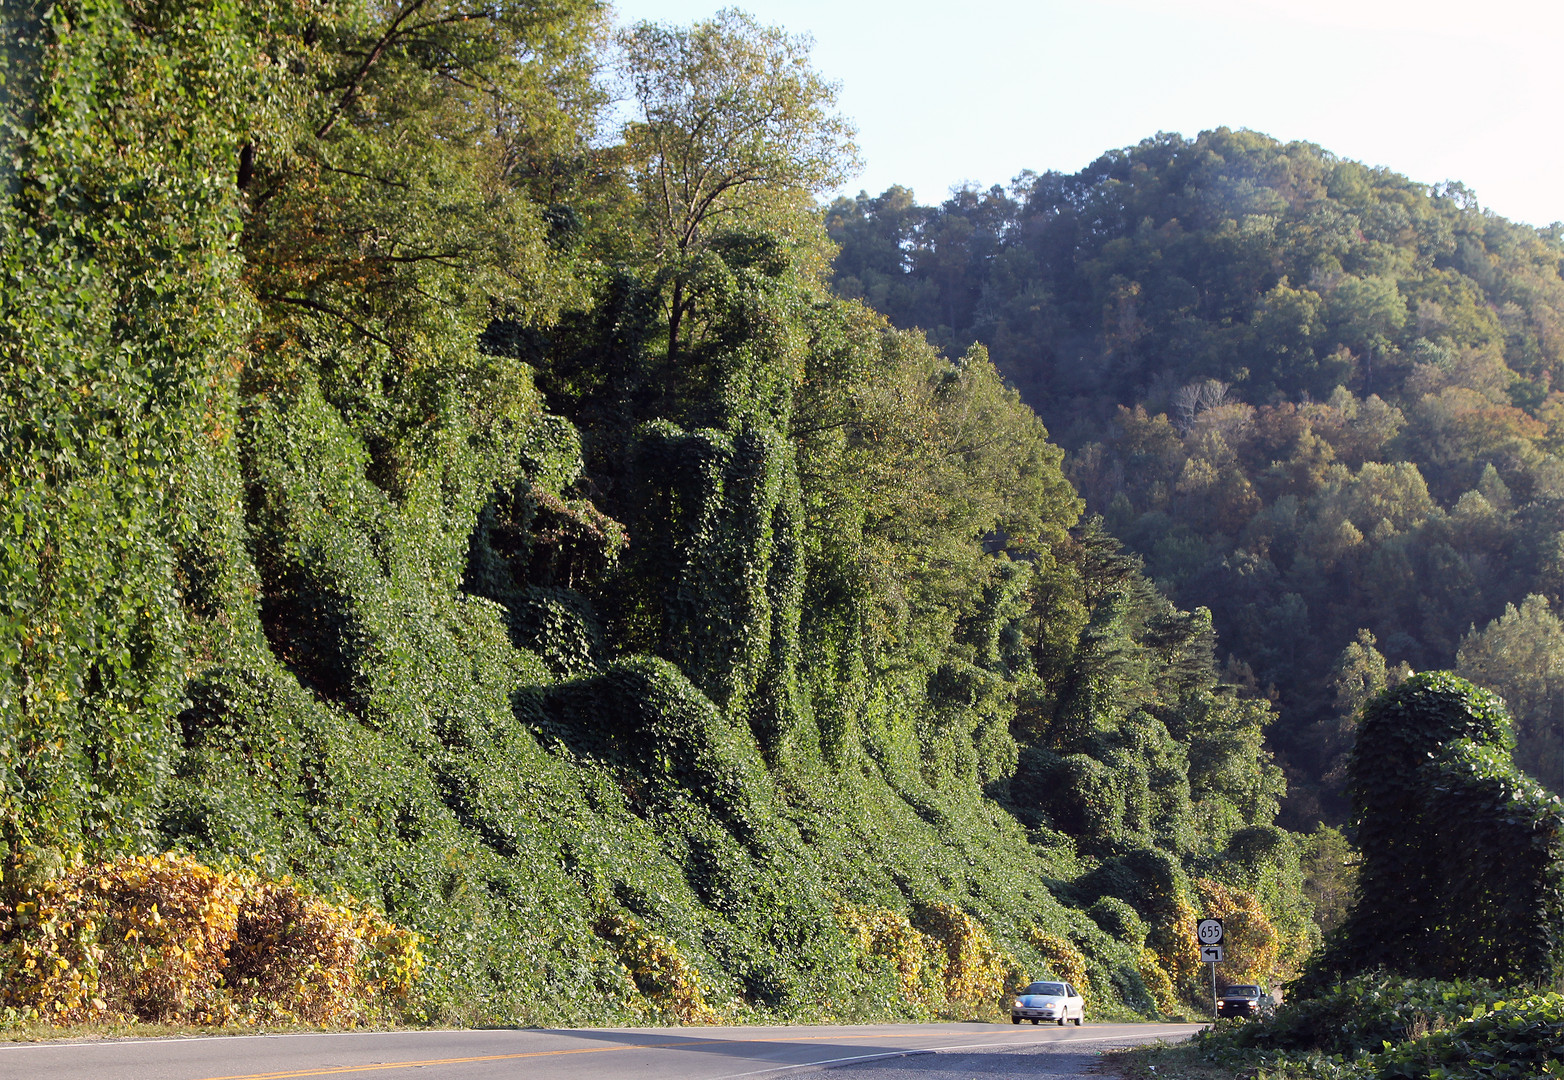 Kudzu (Pueraria montana) erobert als Invasive Art Amerika, hier: West Virginia , USA